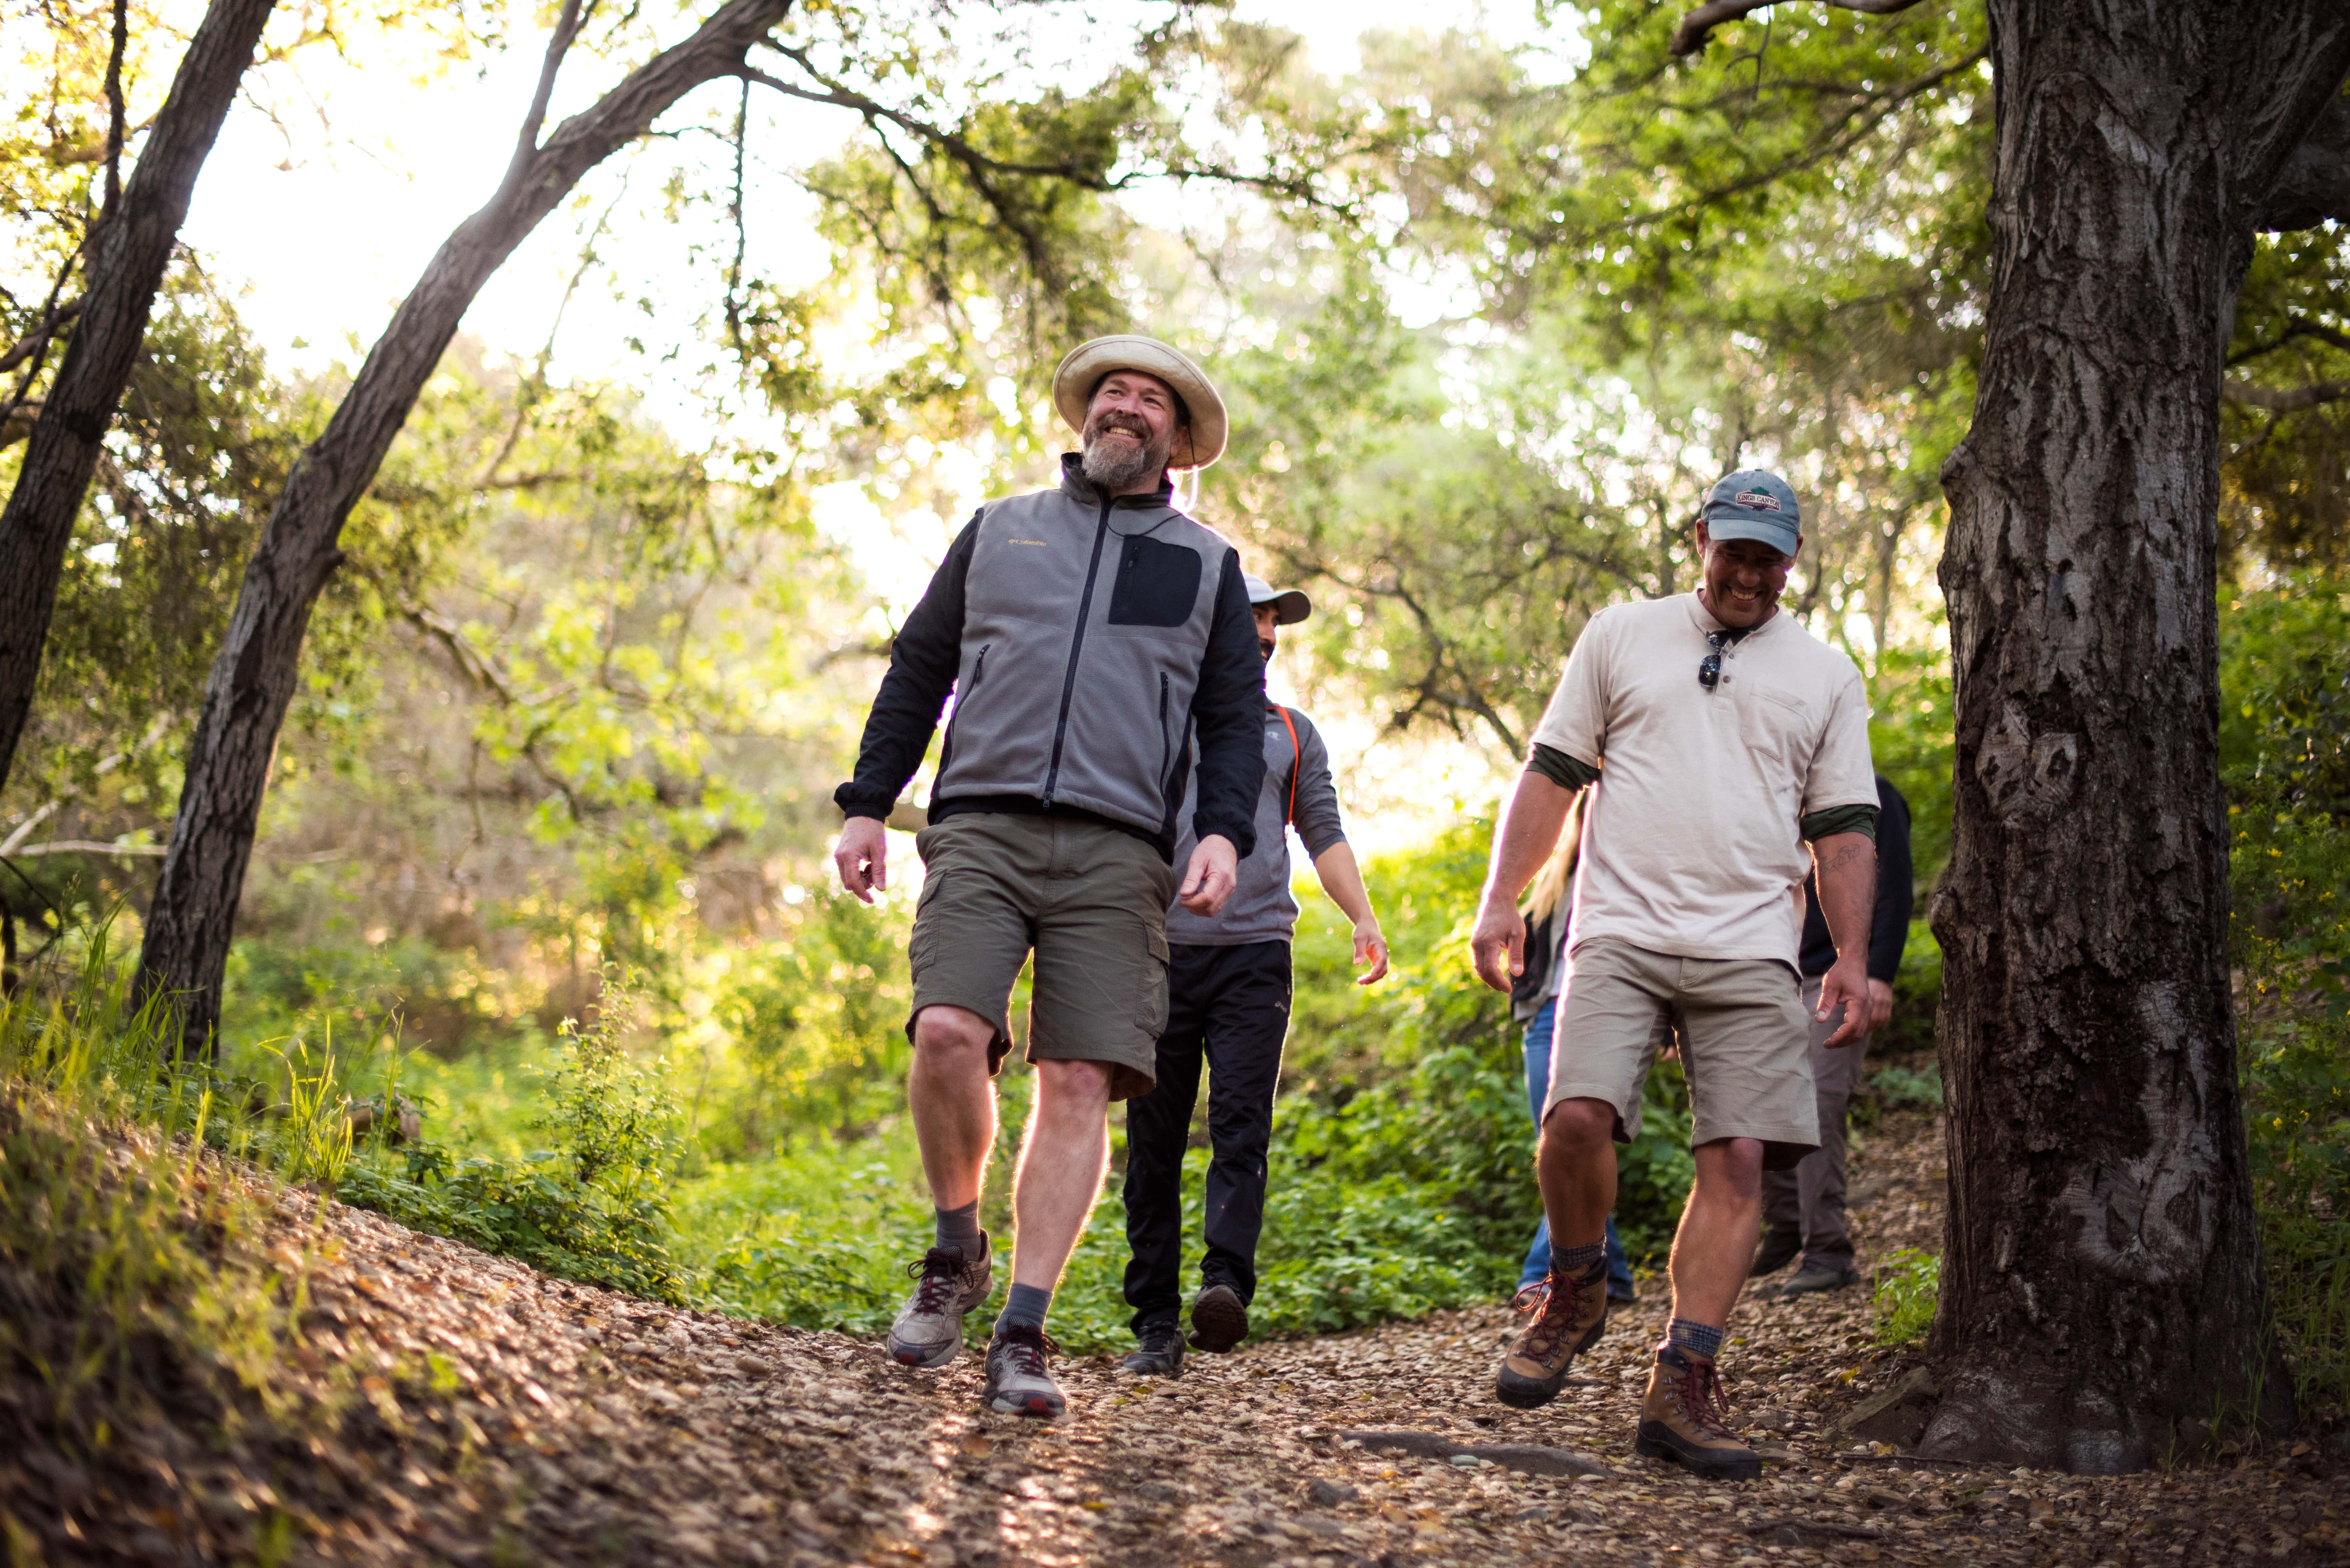 Photo of four people hiking through a lush hiking path.